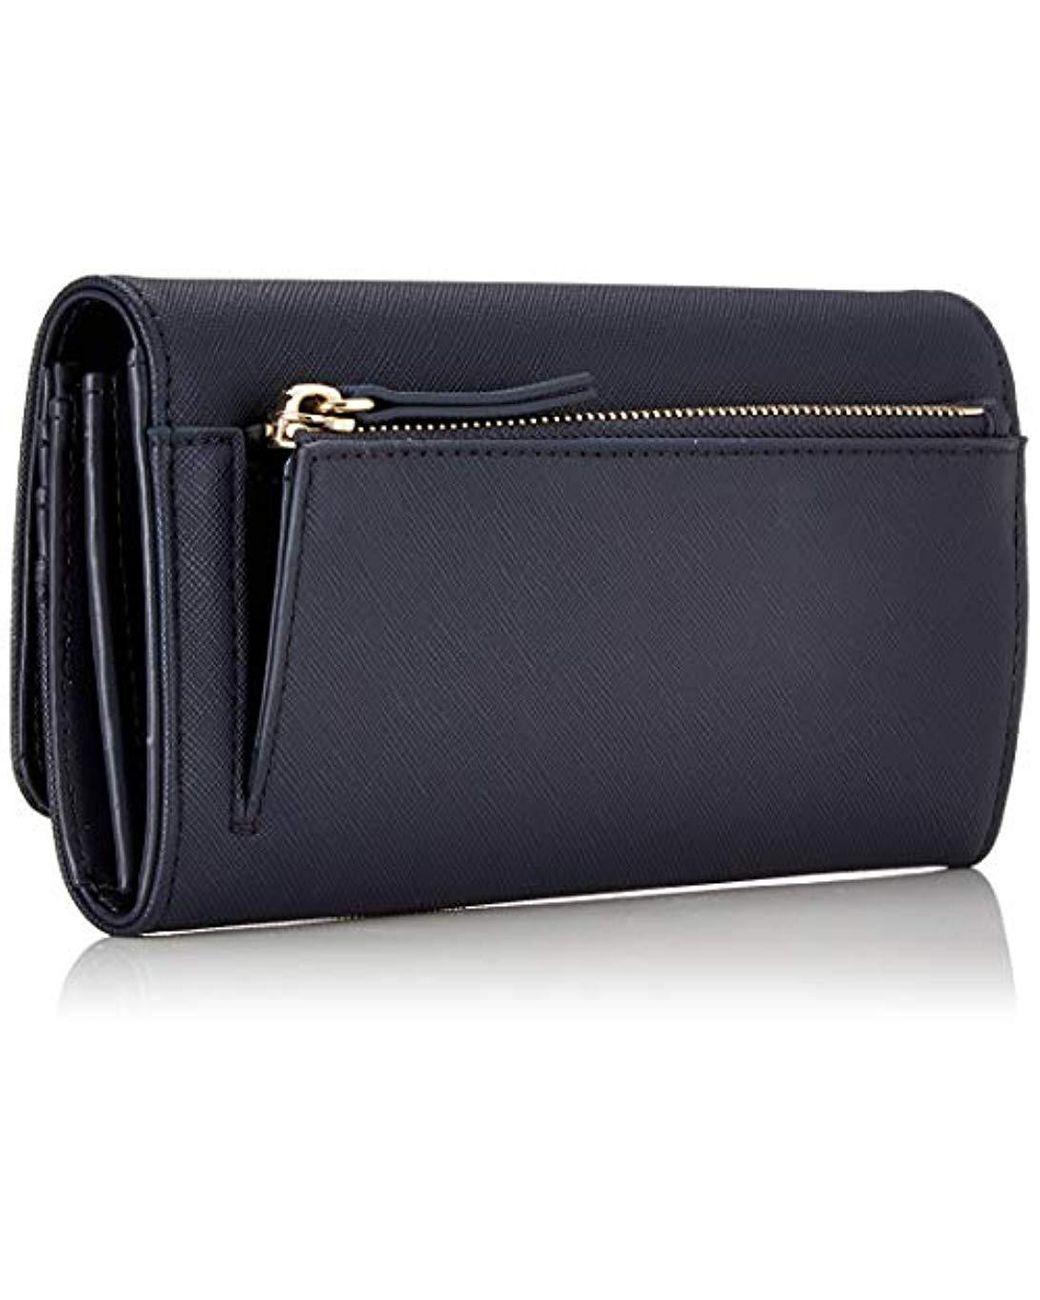 Tommy Hilfiger Varsity Nylon Large Zip Around Wallet portefeuille BLACK noir